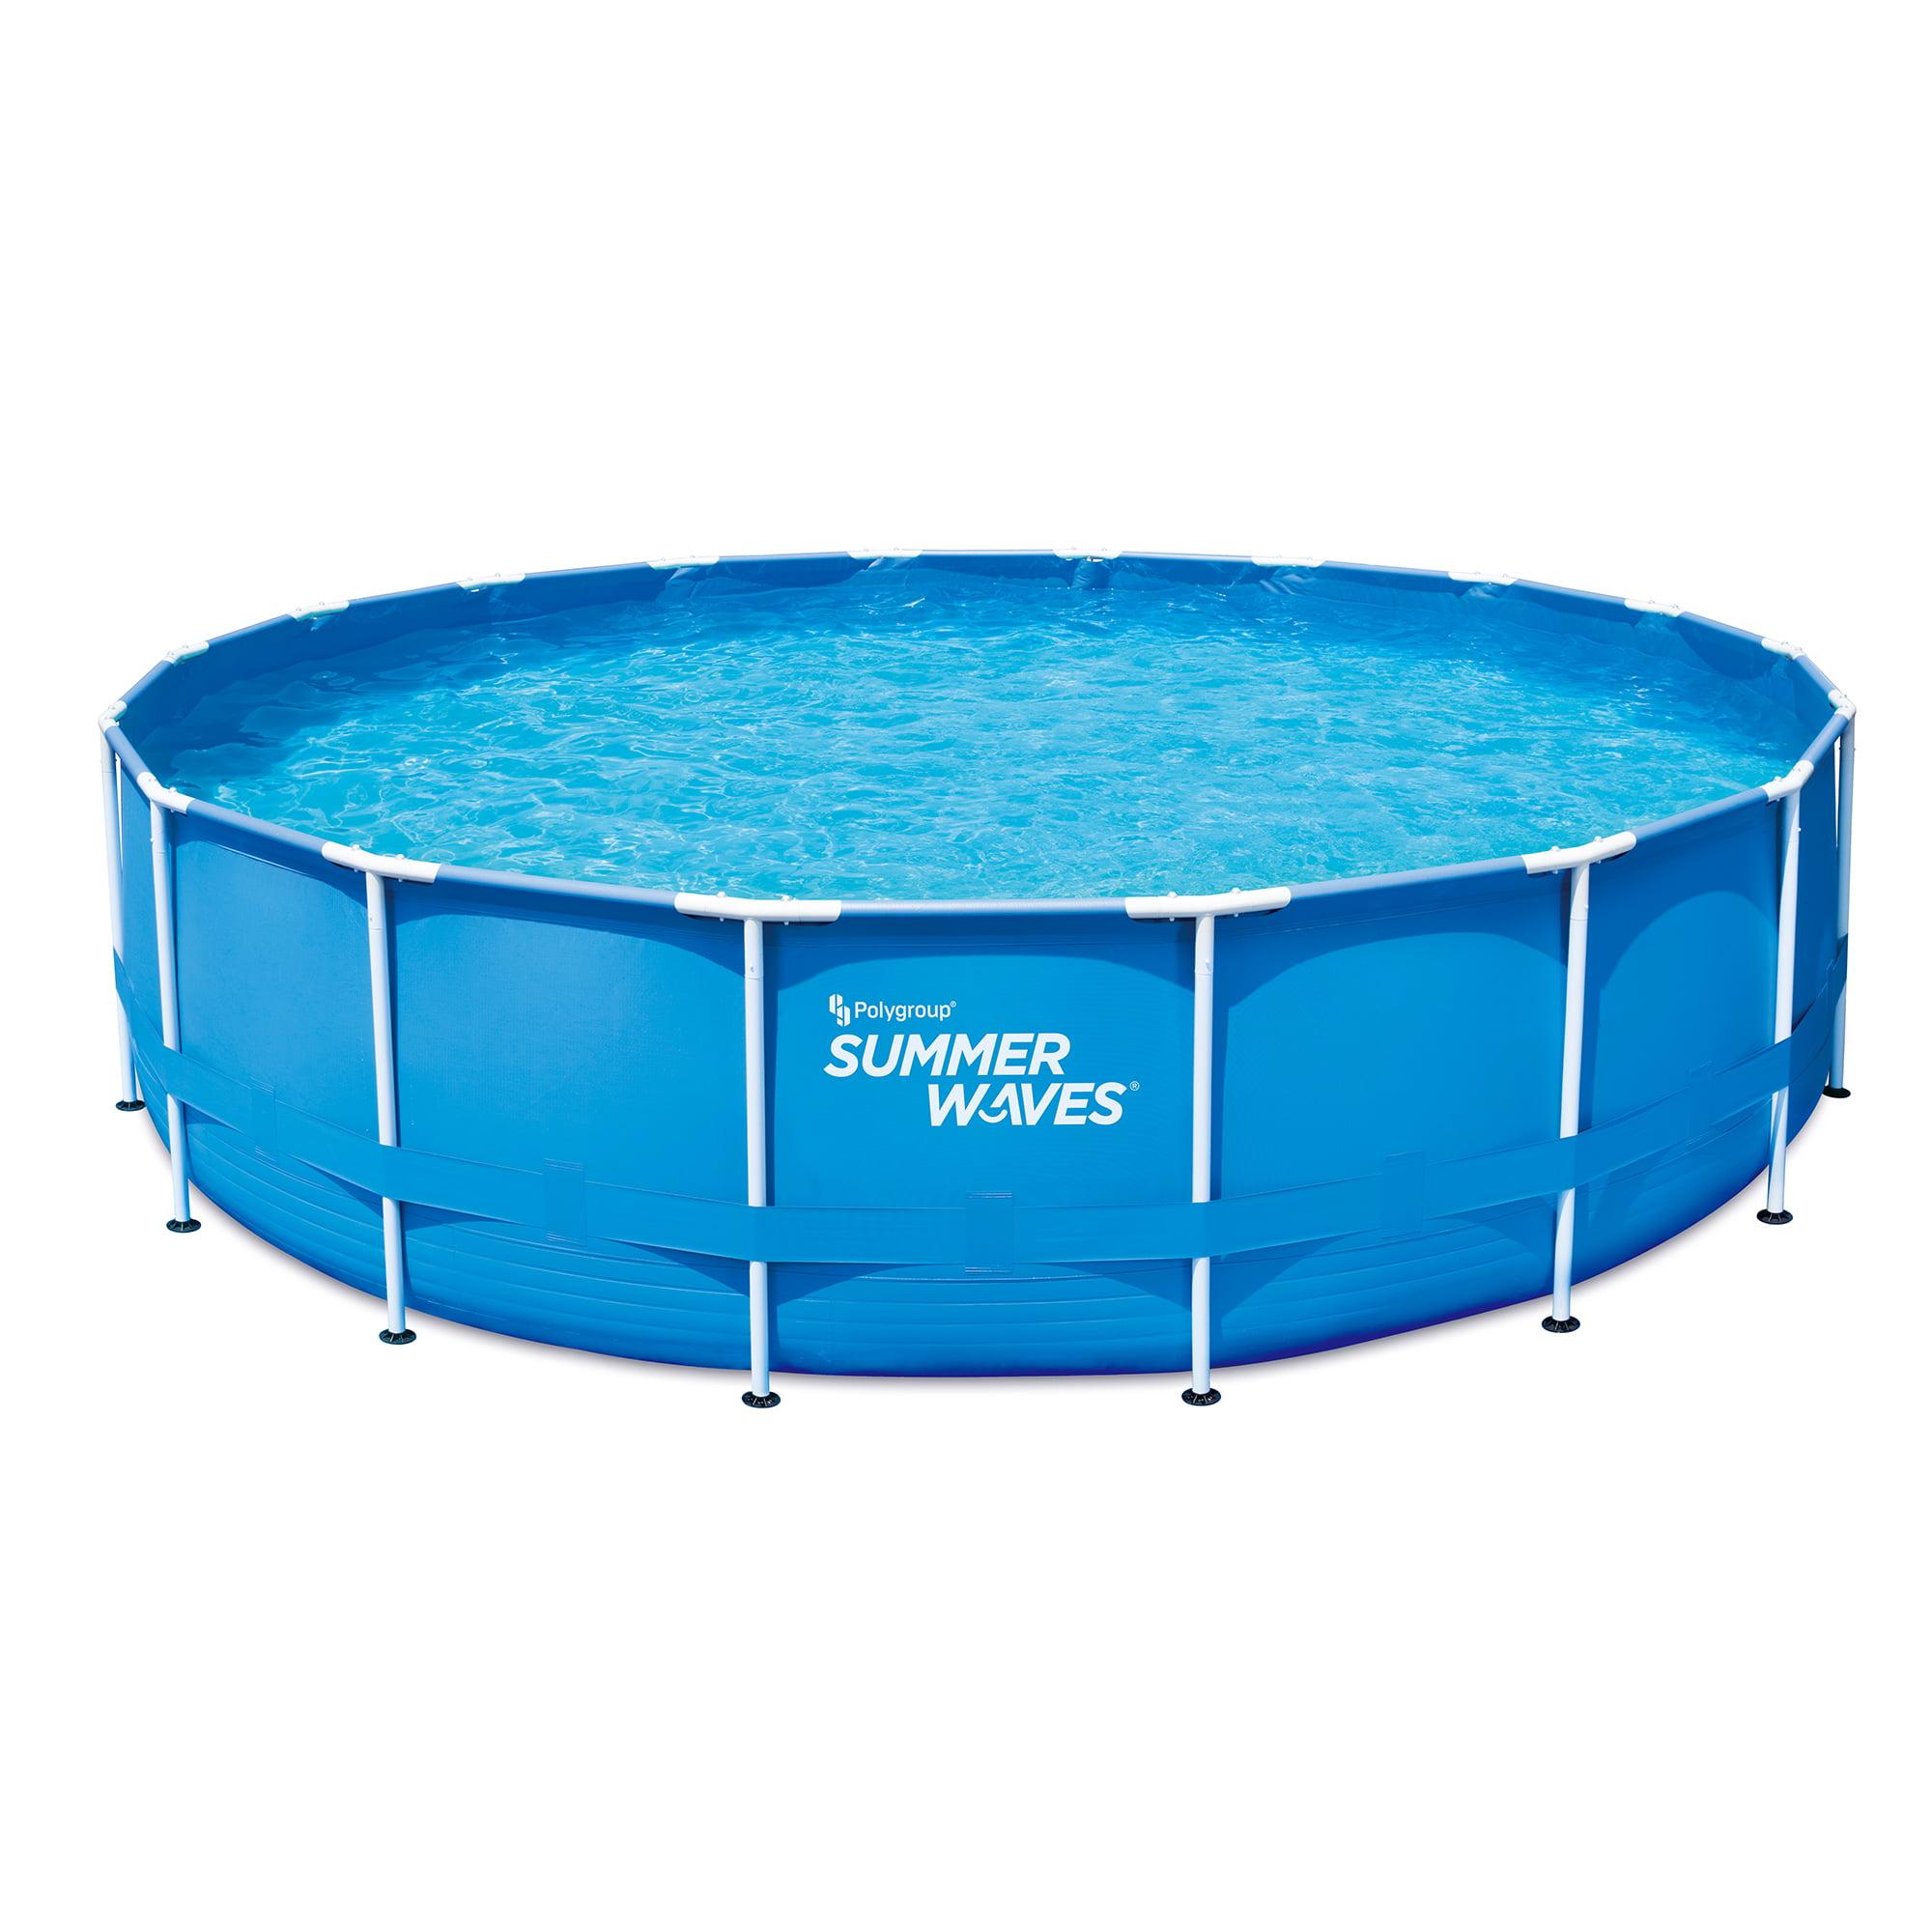 Summer Waves 18 Ft Metal Frame Above Ground Pool With 1 500 Gph Filter Pump Walmart Com Walmart Com